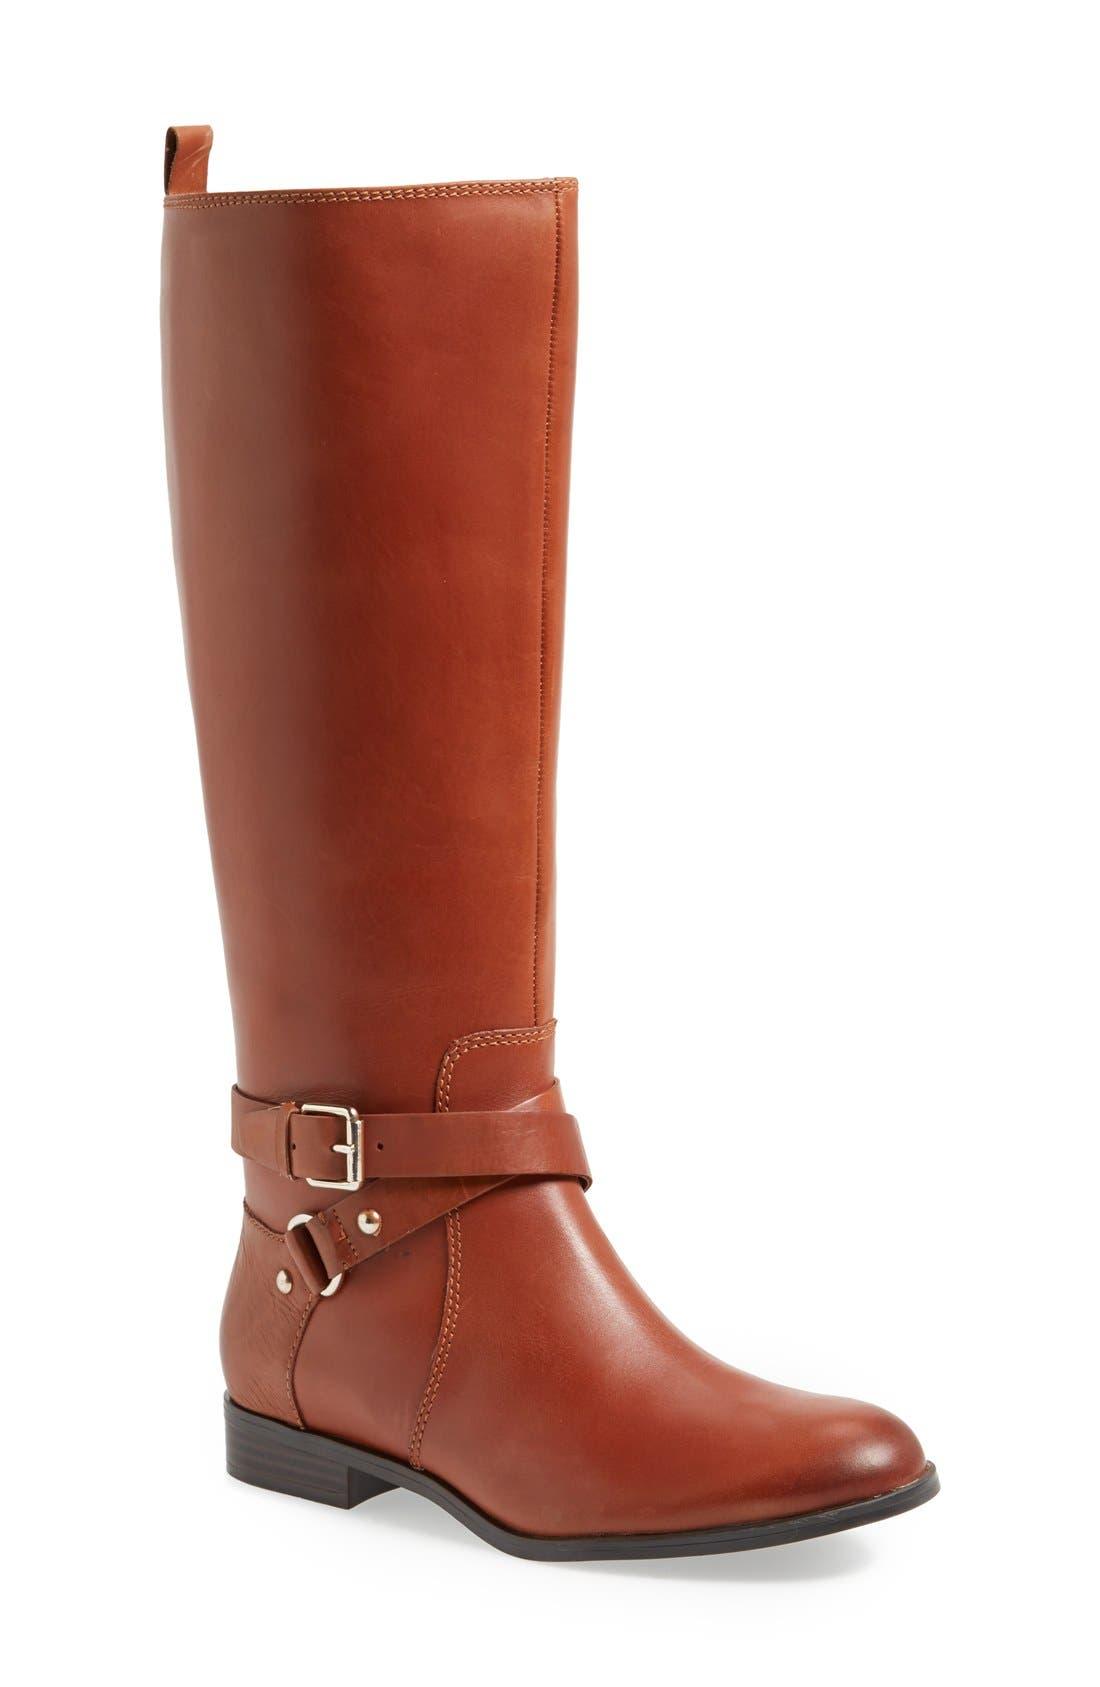 Main Image - Enzo Angiolini 'Daniana' Knee High Leather Boot (Wide Calf) (Women)